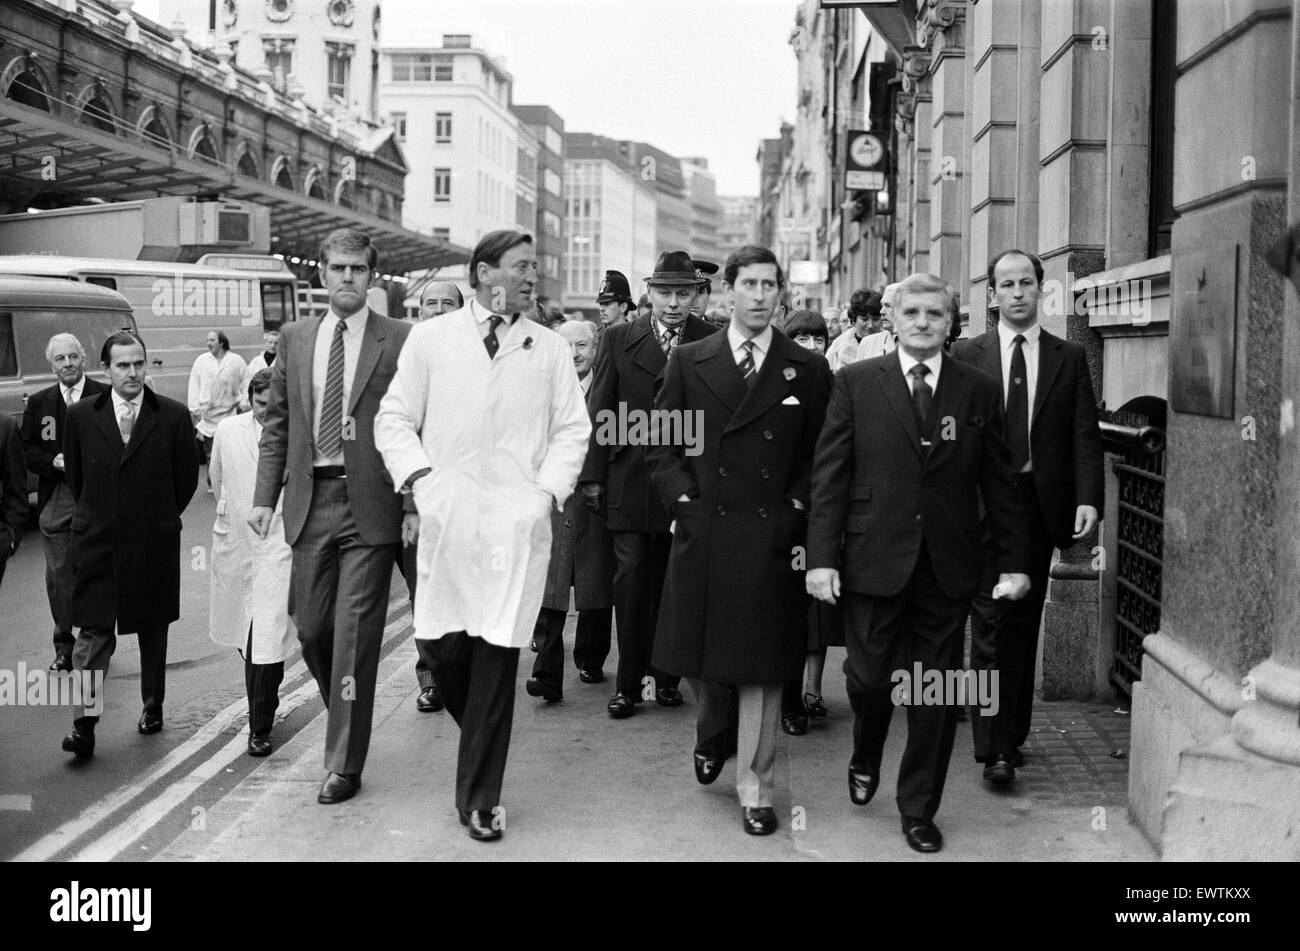 Prince Charles, Prince of Wales, visits Smithfield Market. 4th November 1980. - Stock Image